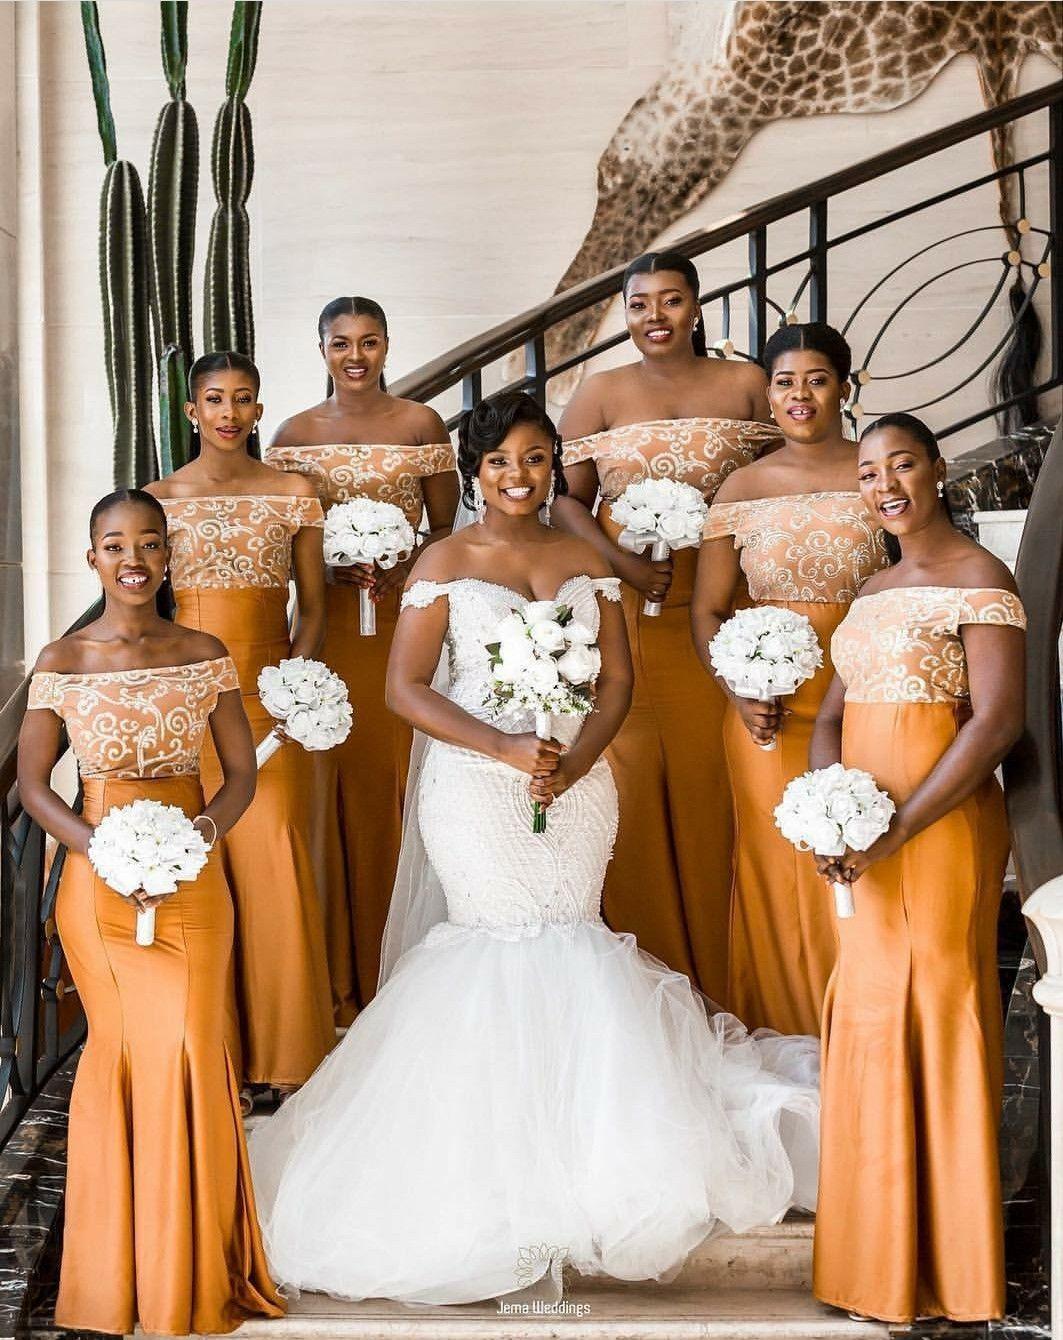 My Dress African Bridesmaid Dresses African Wedding Attire Yellow Bridesmaid Dresses